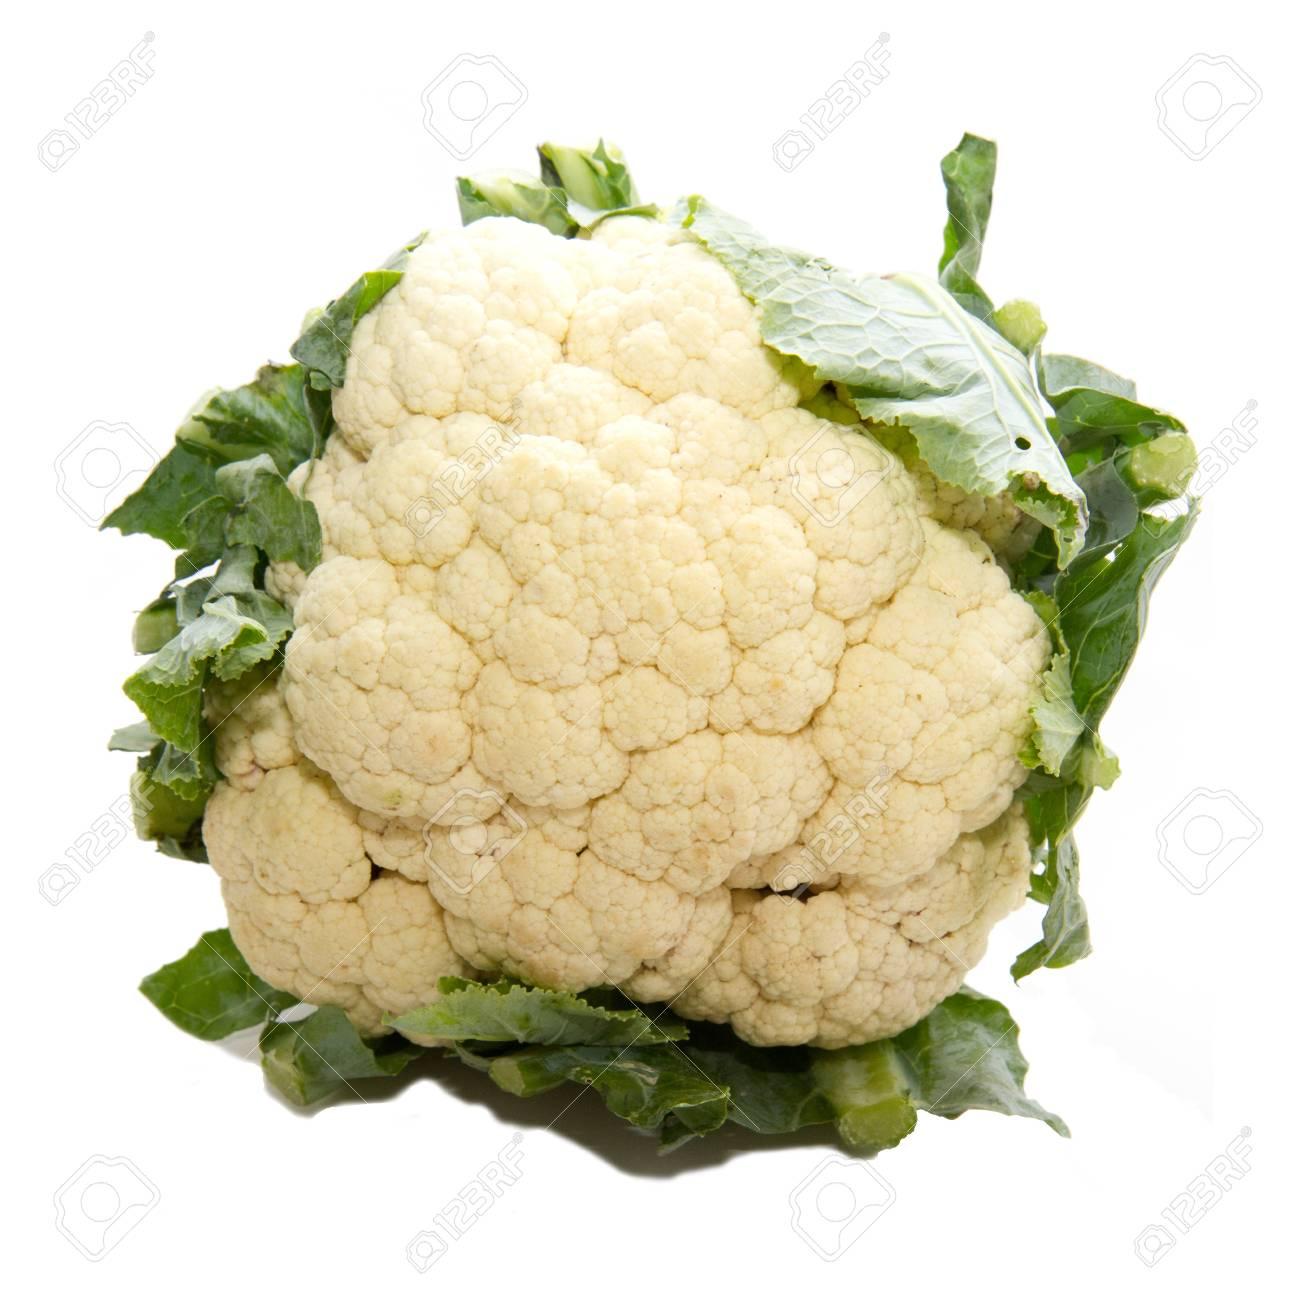 Fresh cauliflower isolated on white background Standard-Bild - 17173859